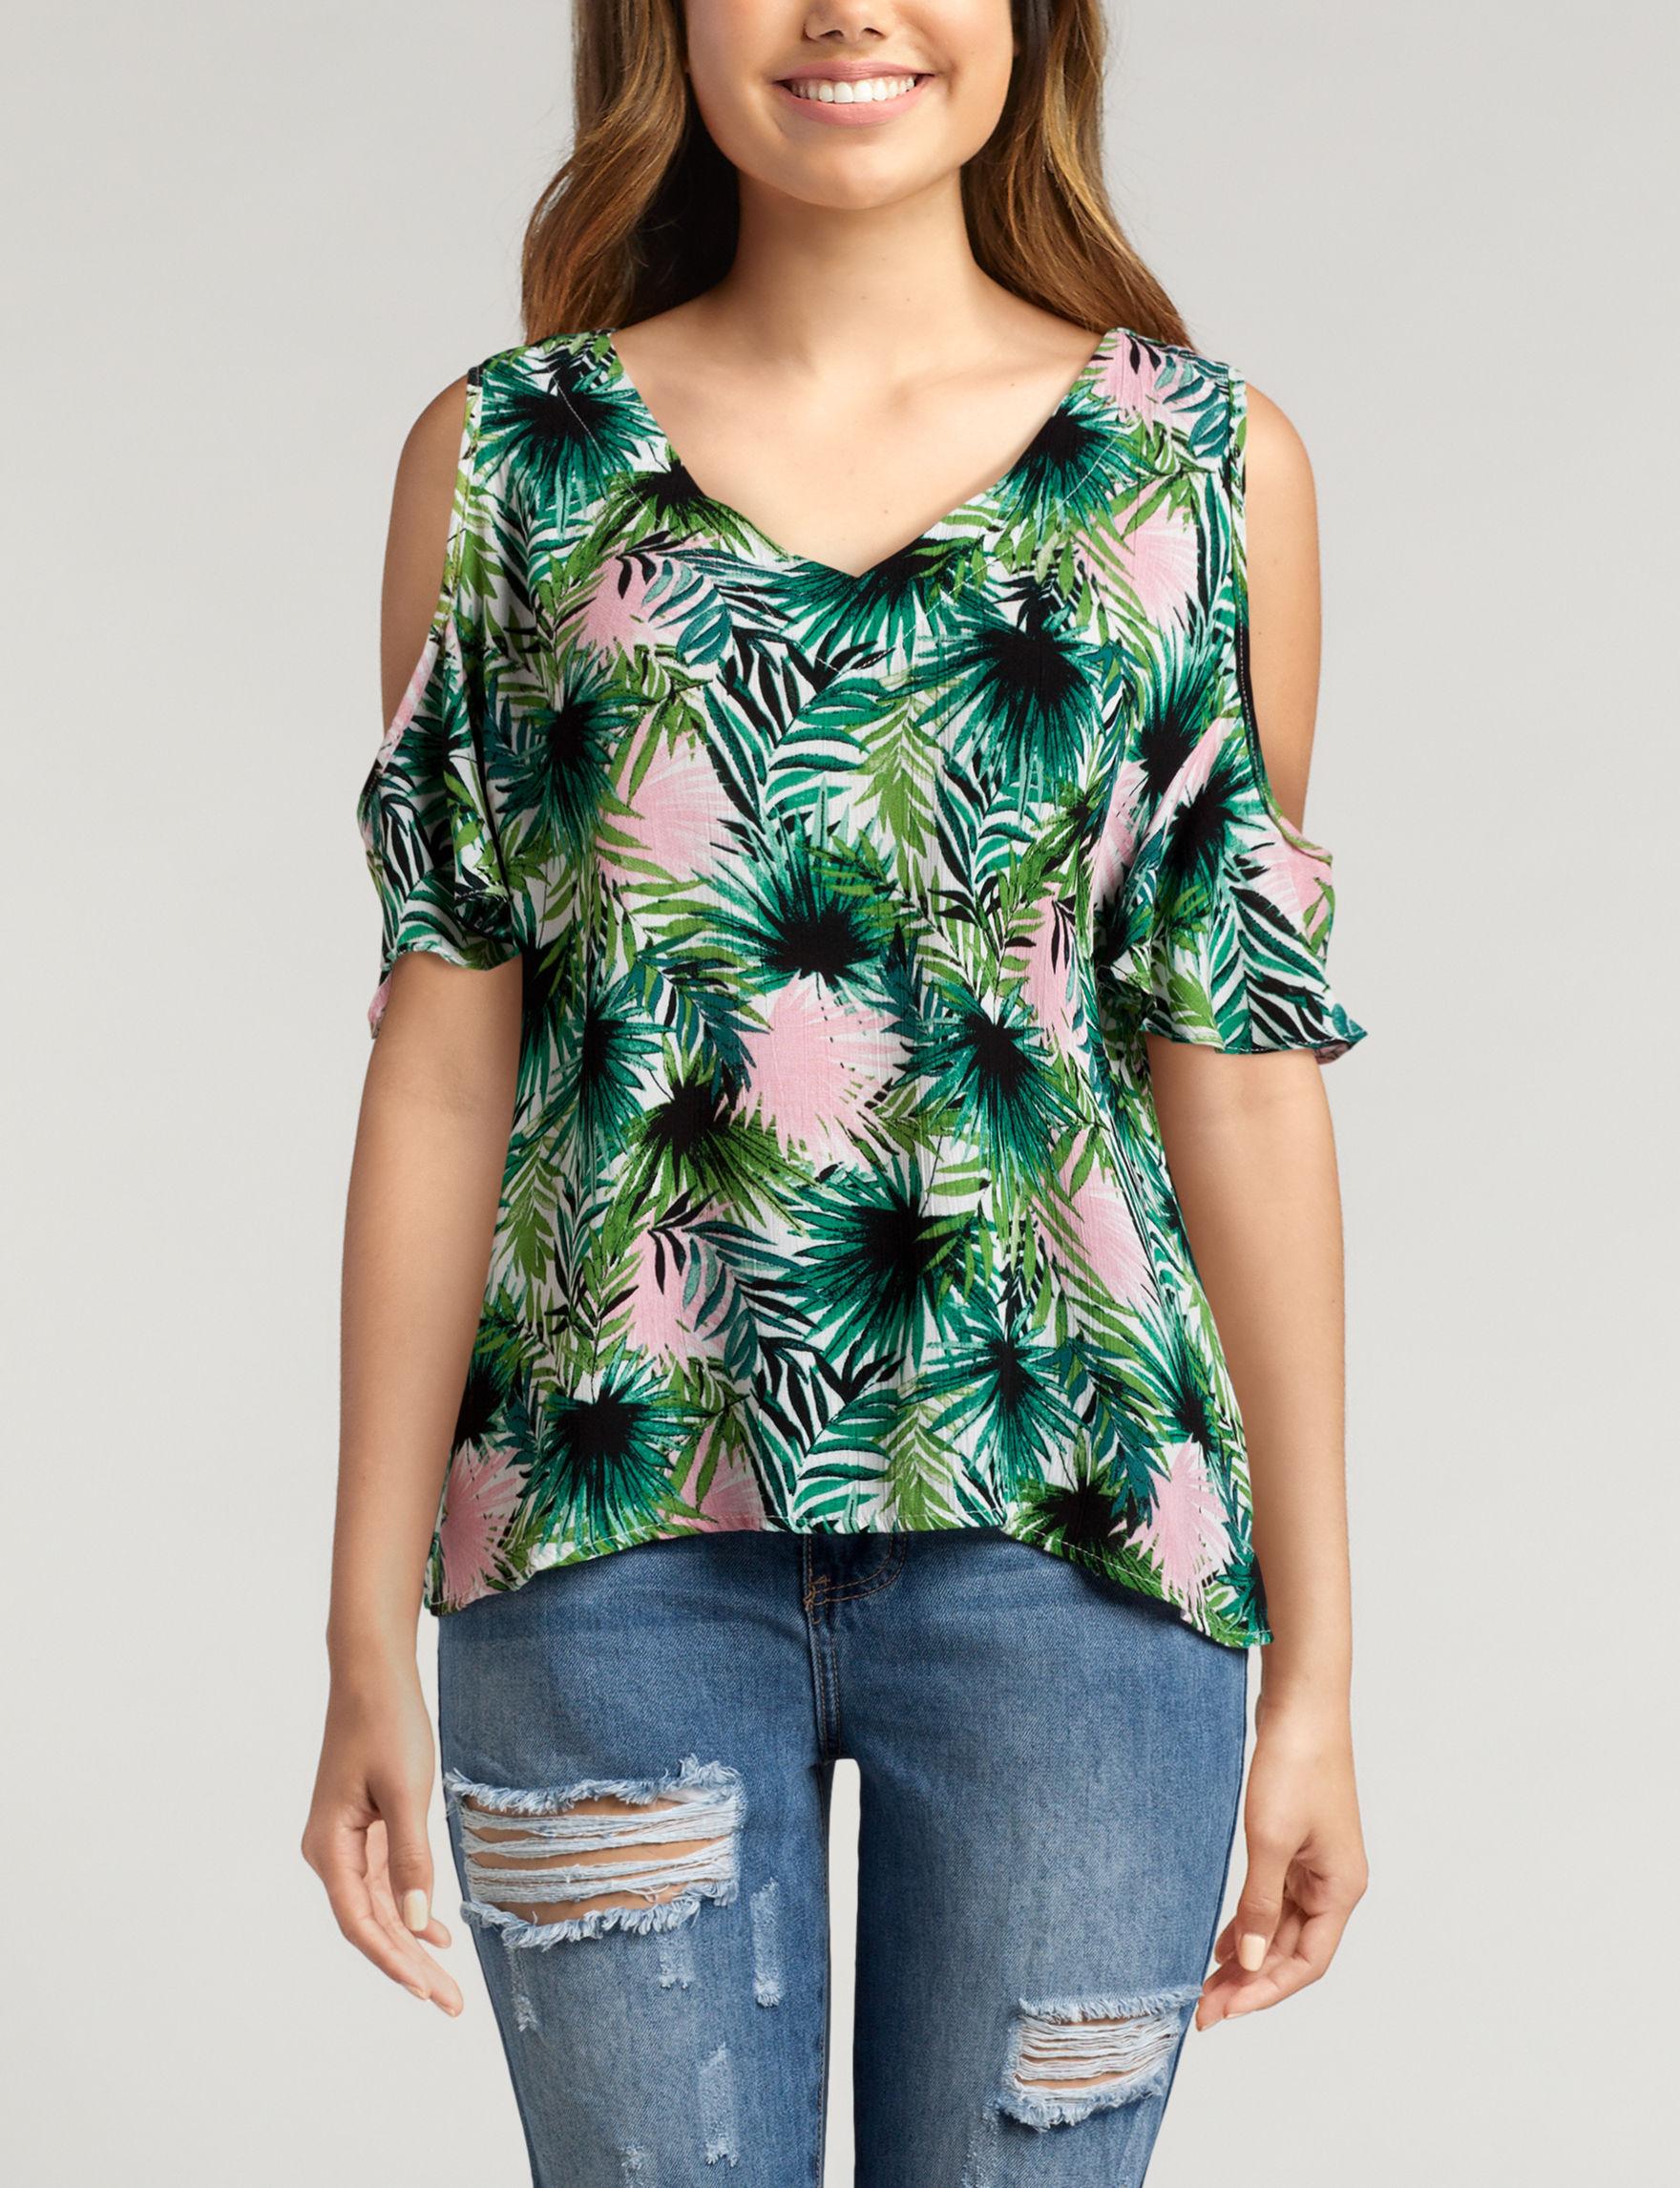 Wishful Park Green Shirts & Blouses